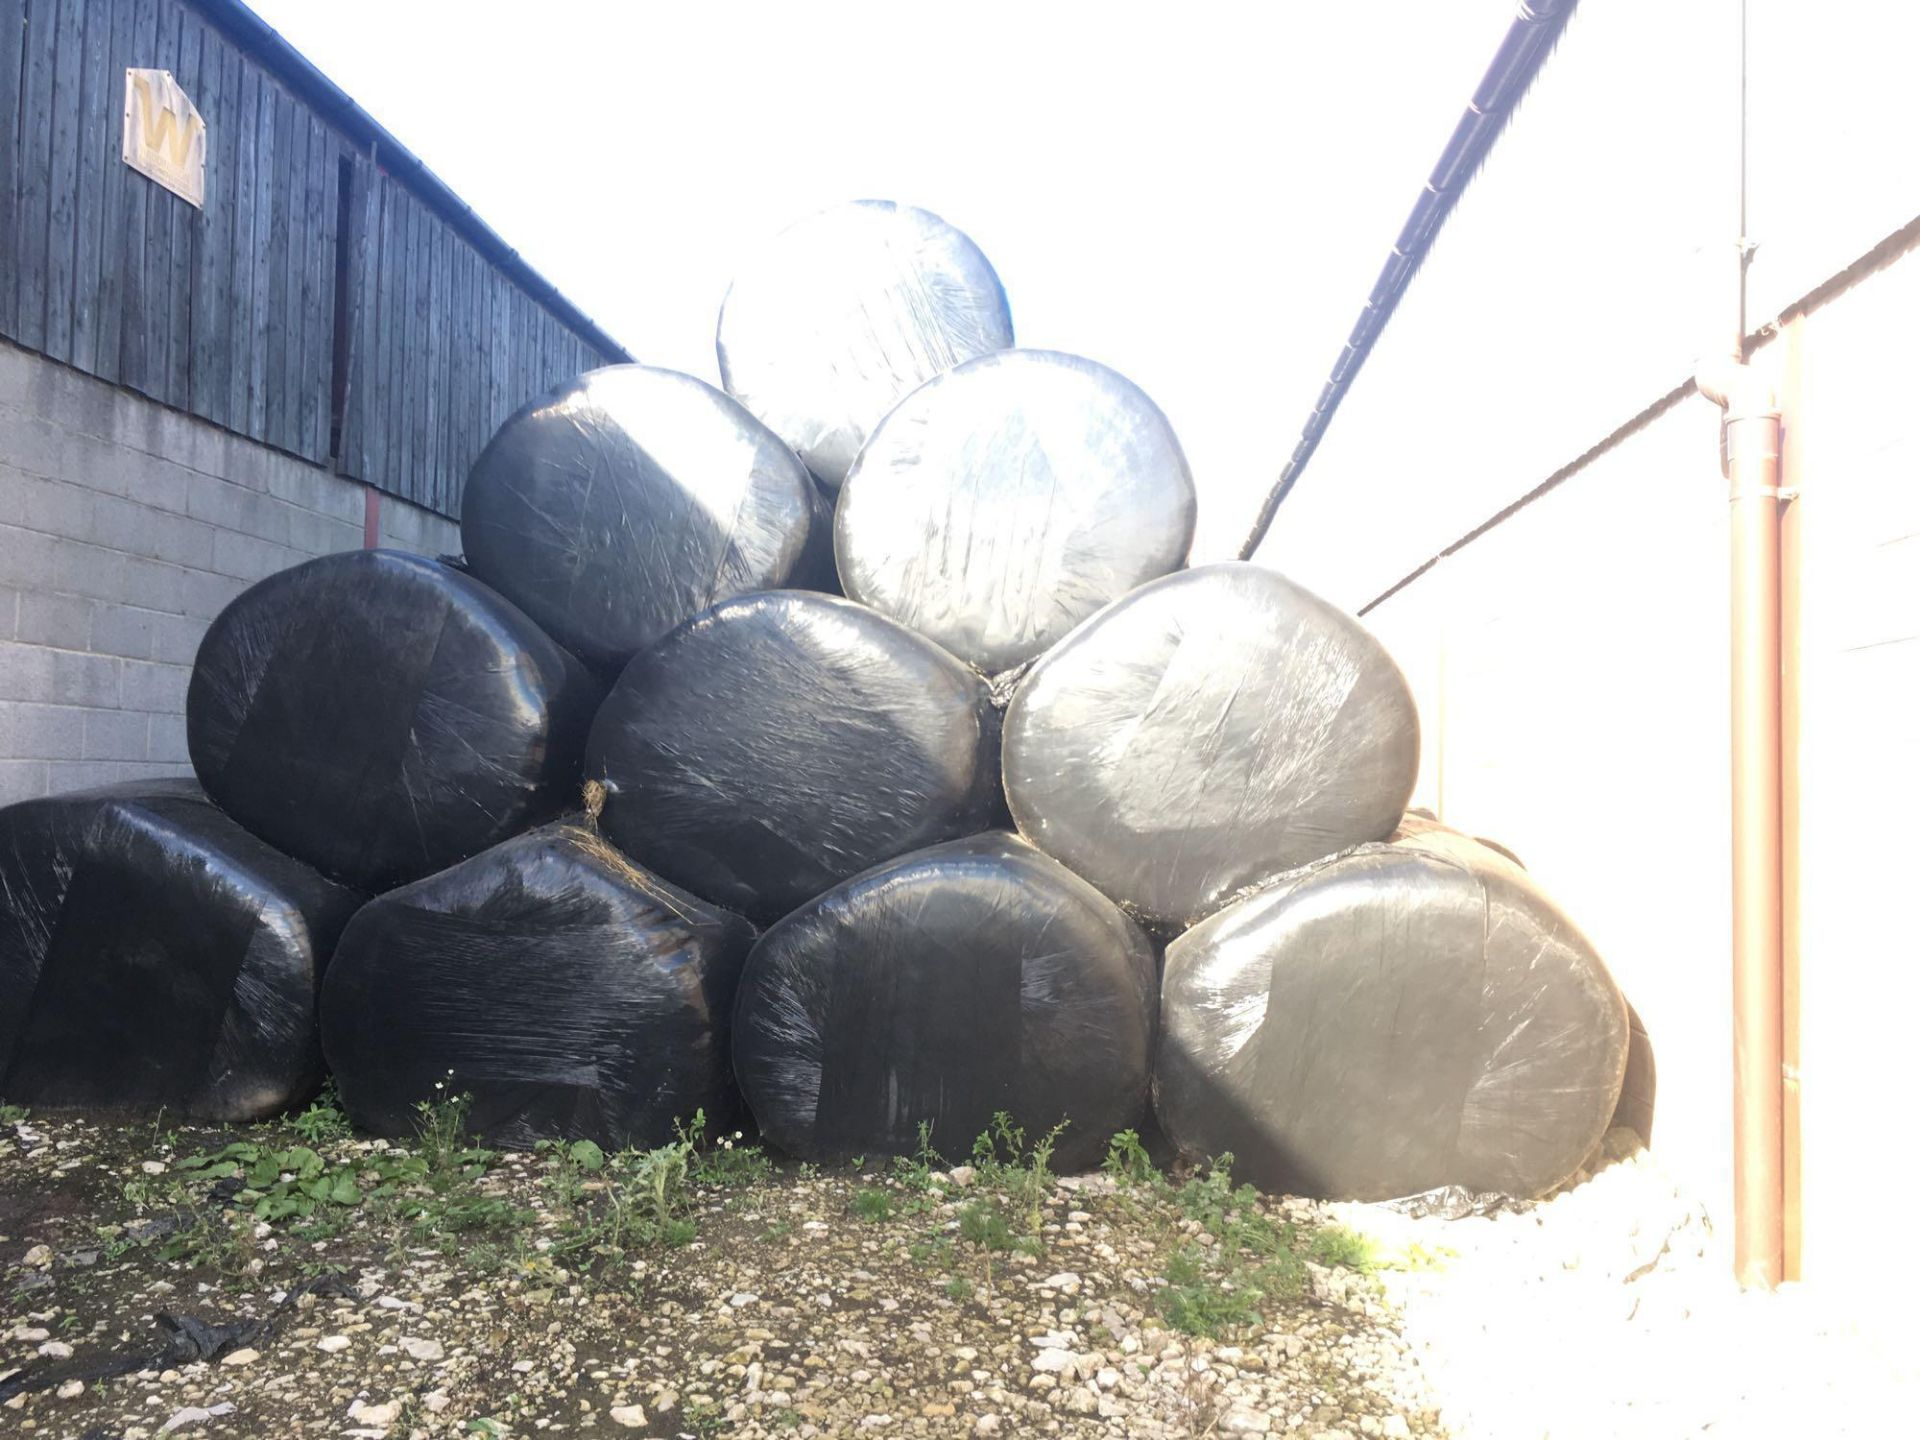 Qty of 2019 silage bales (circa 119 bales) - Image 3 of 4